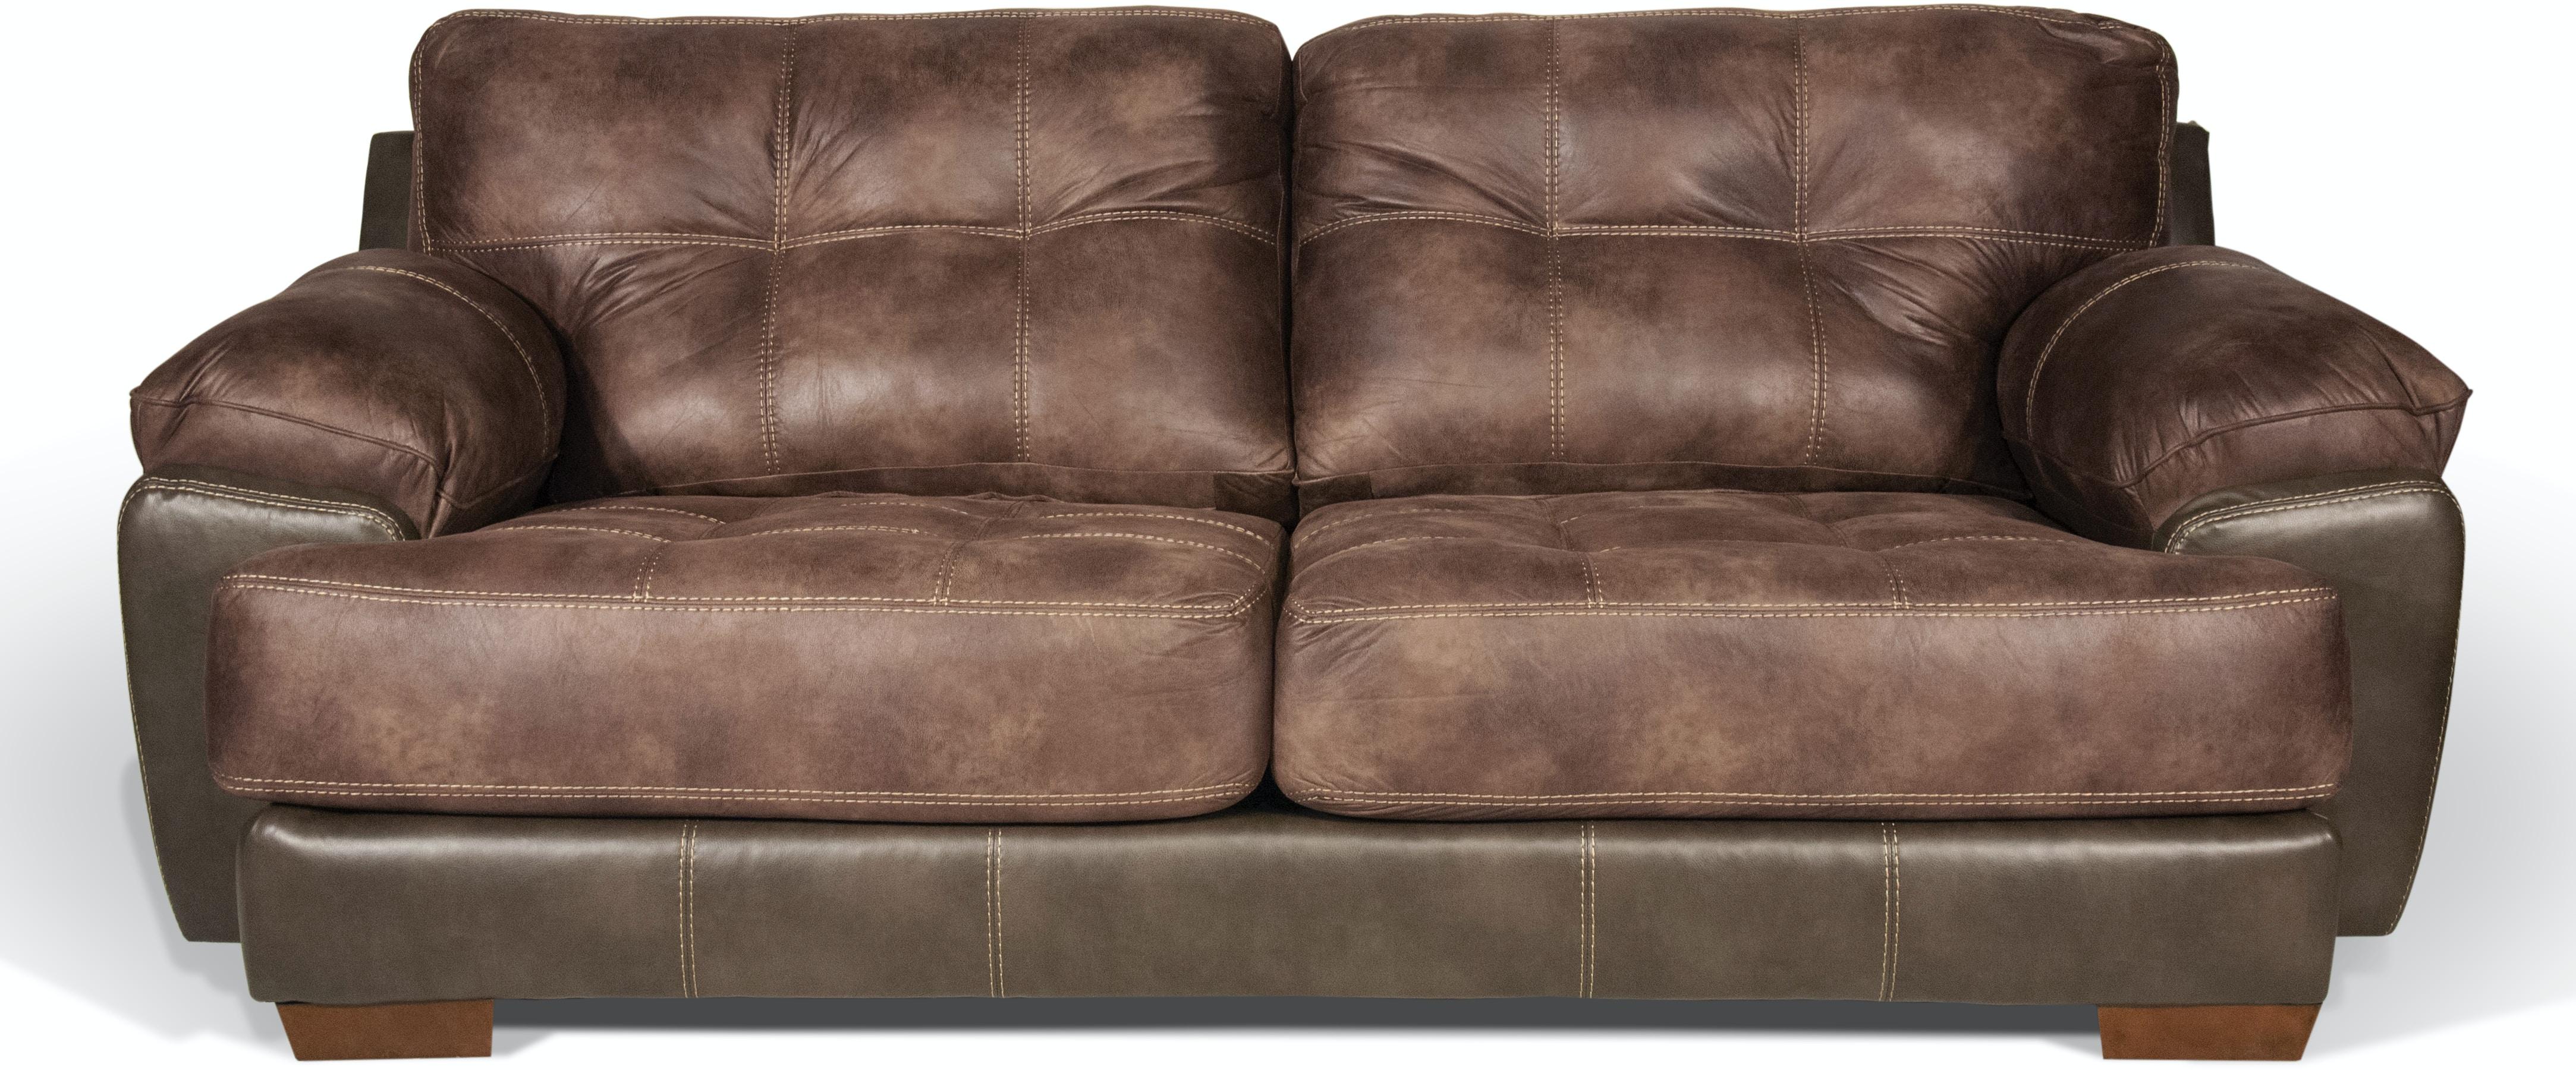 New Jackson Furniture Reynolds Sofa UPH SOFA REYNOLDS Amazing - Model Of Jackson Furniture sofa Trending